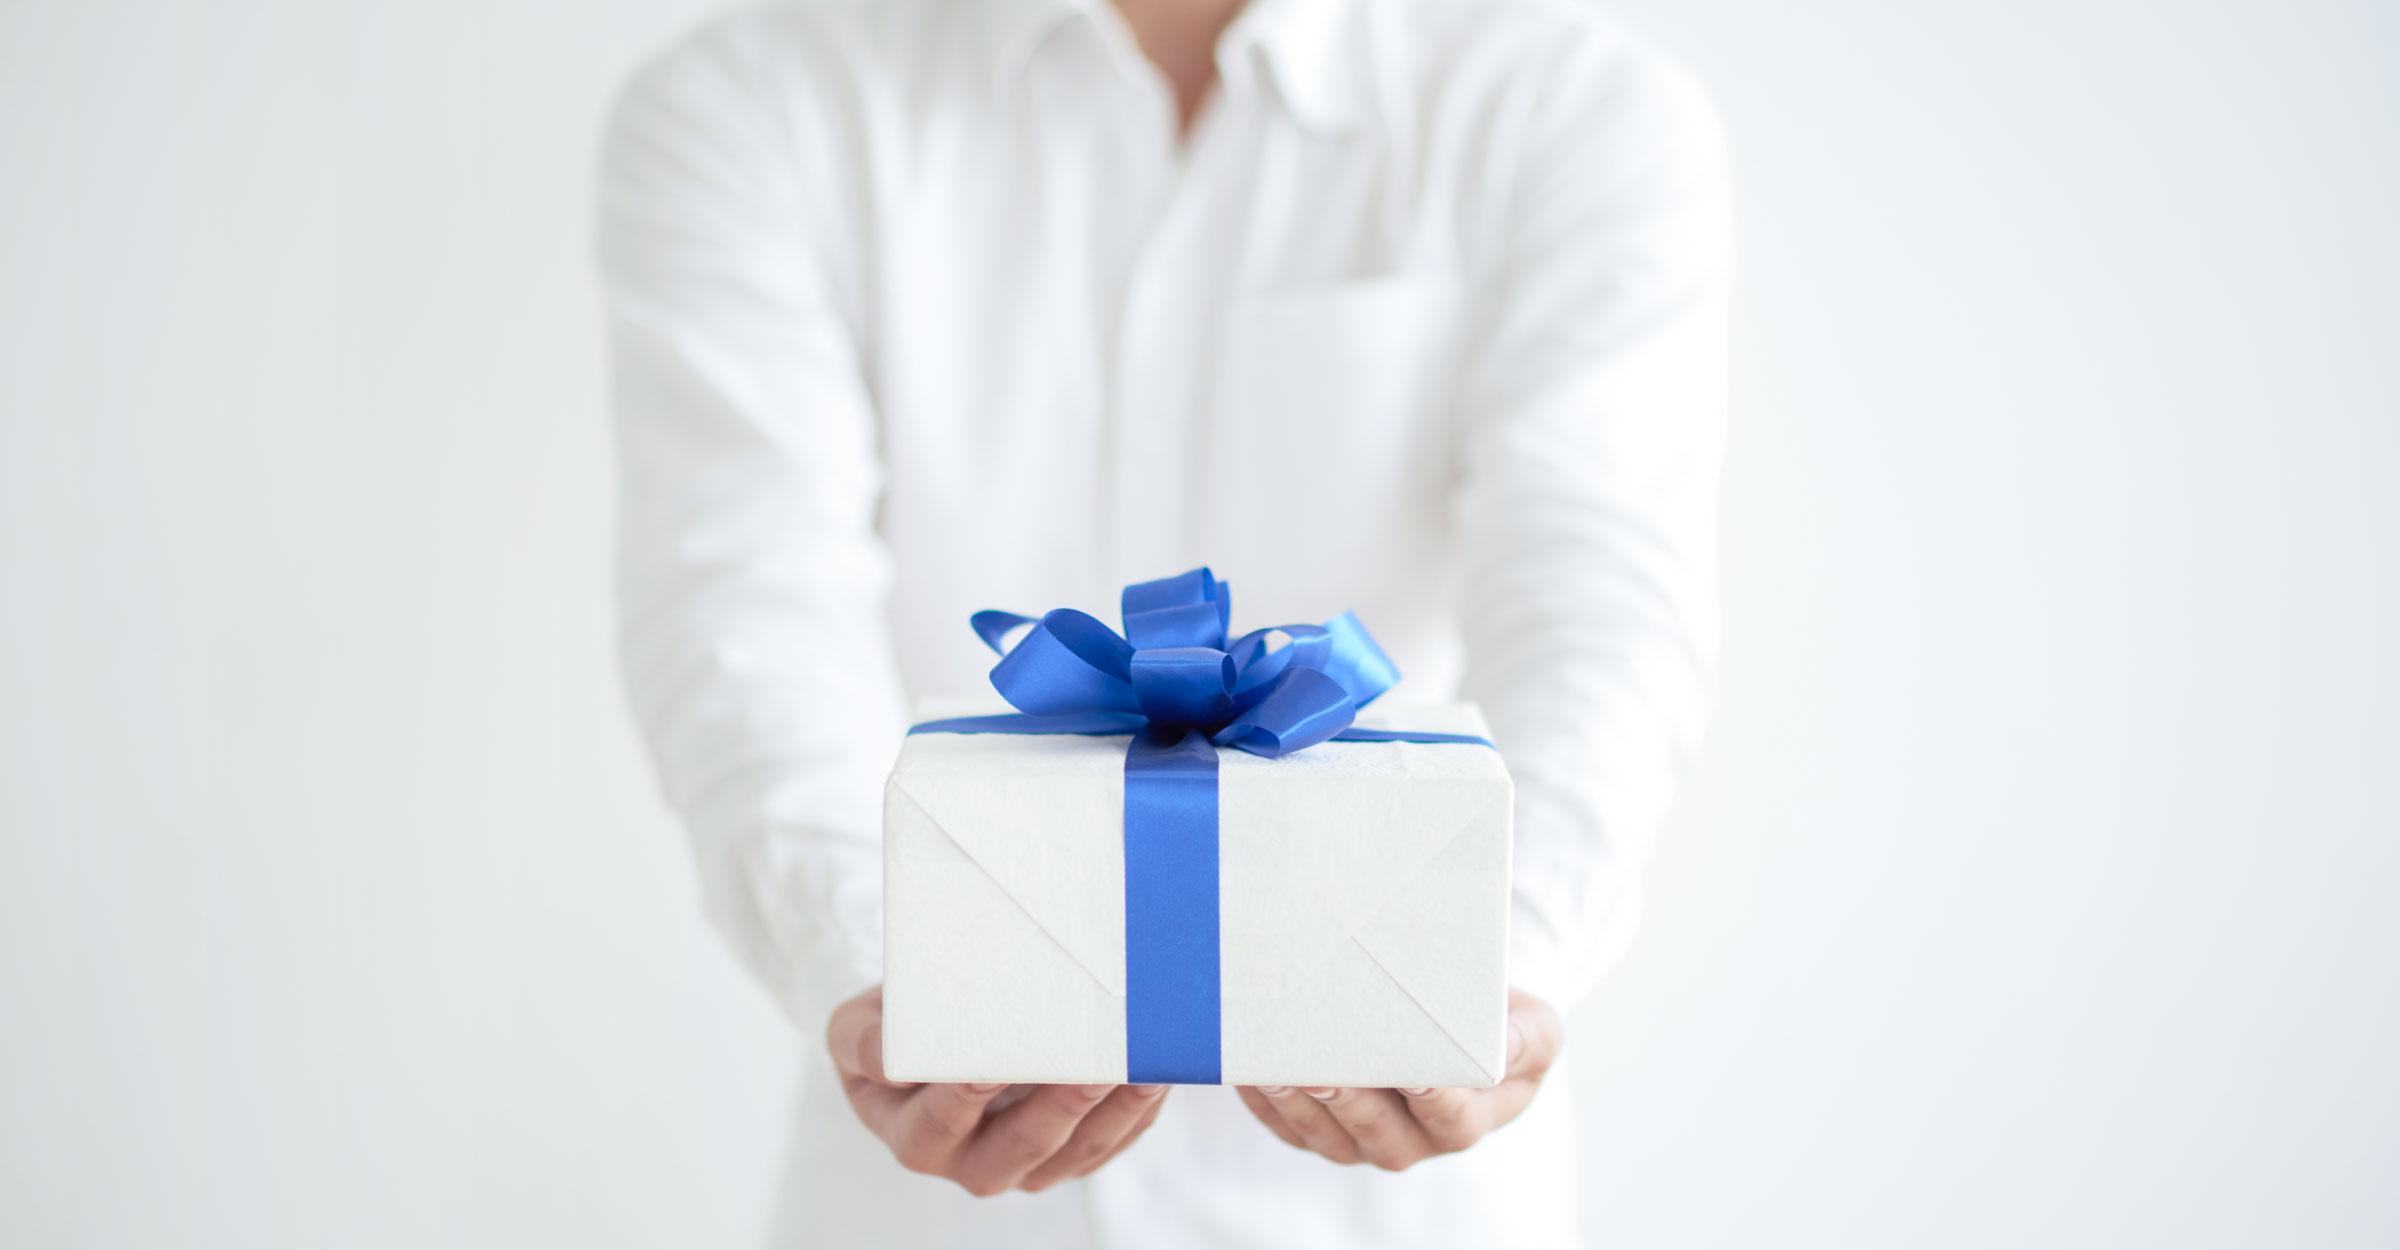 TADA-Membantu-Kamu-Memberikan-Reward-Secara-Terukur-untuk-Karyawan,-Klien,-dan-Partner